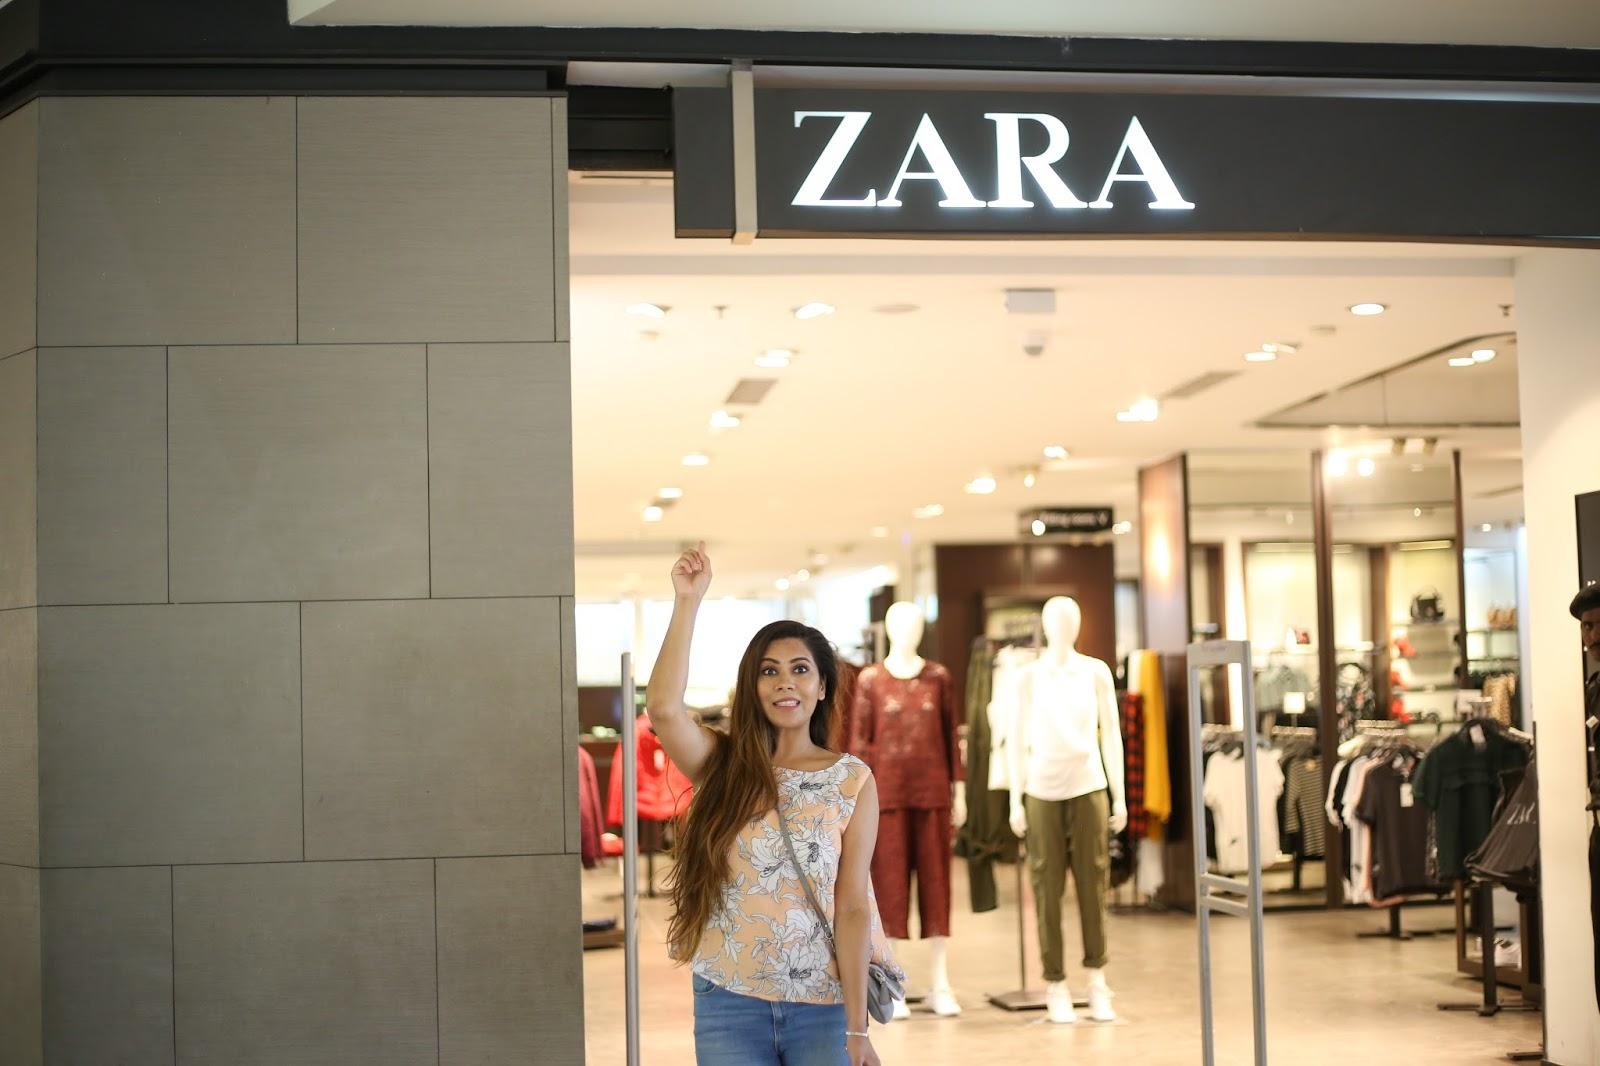 Buy zara clothes online india